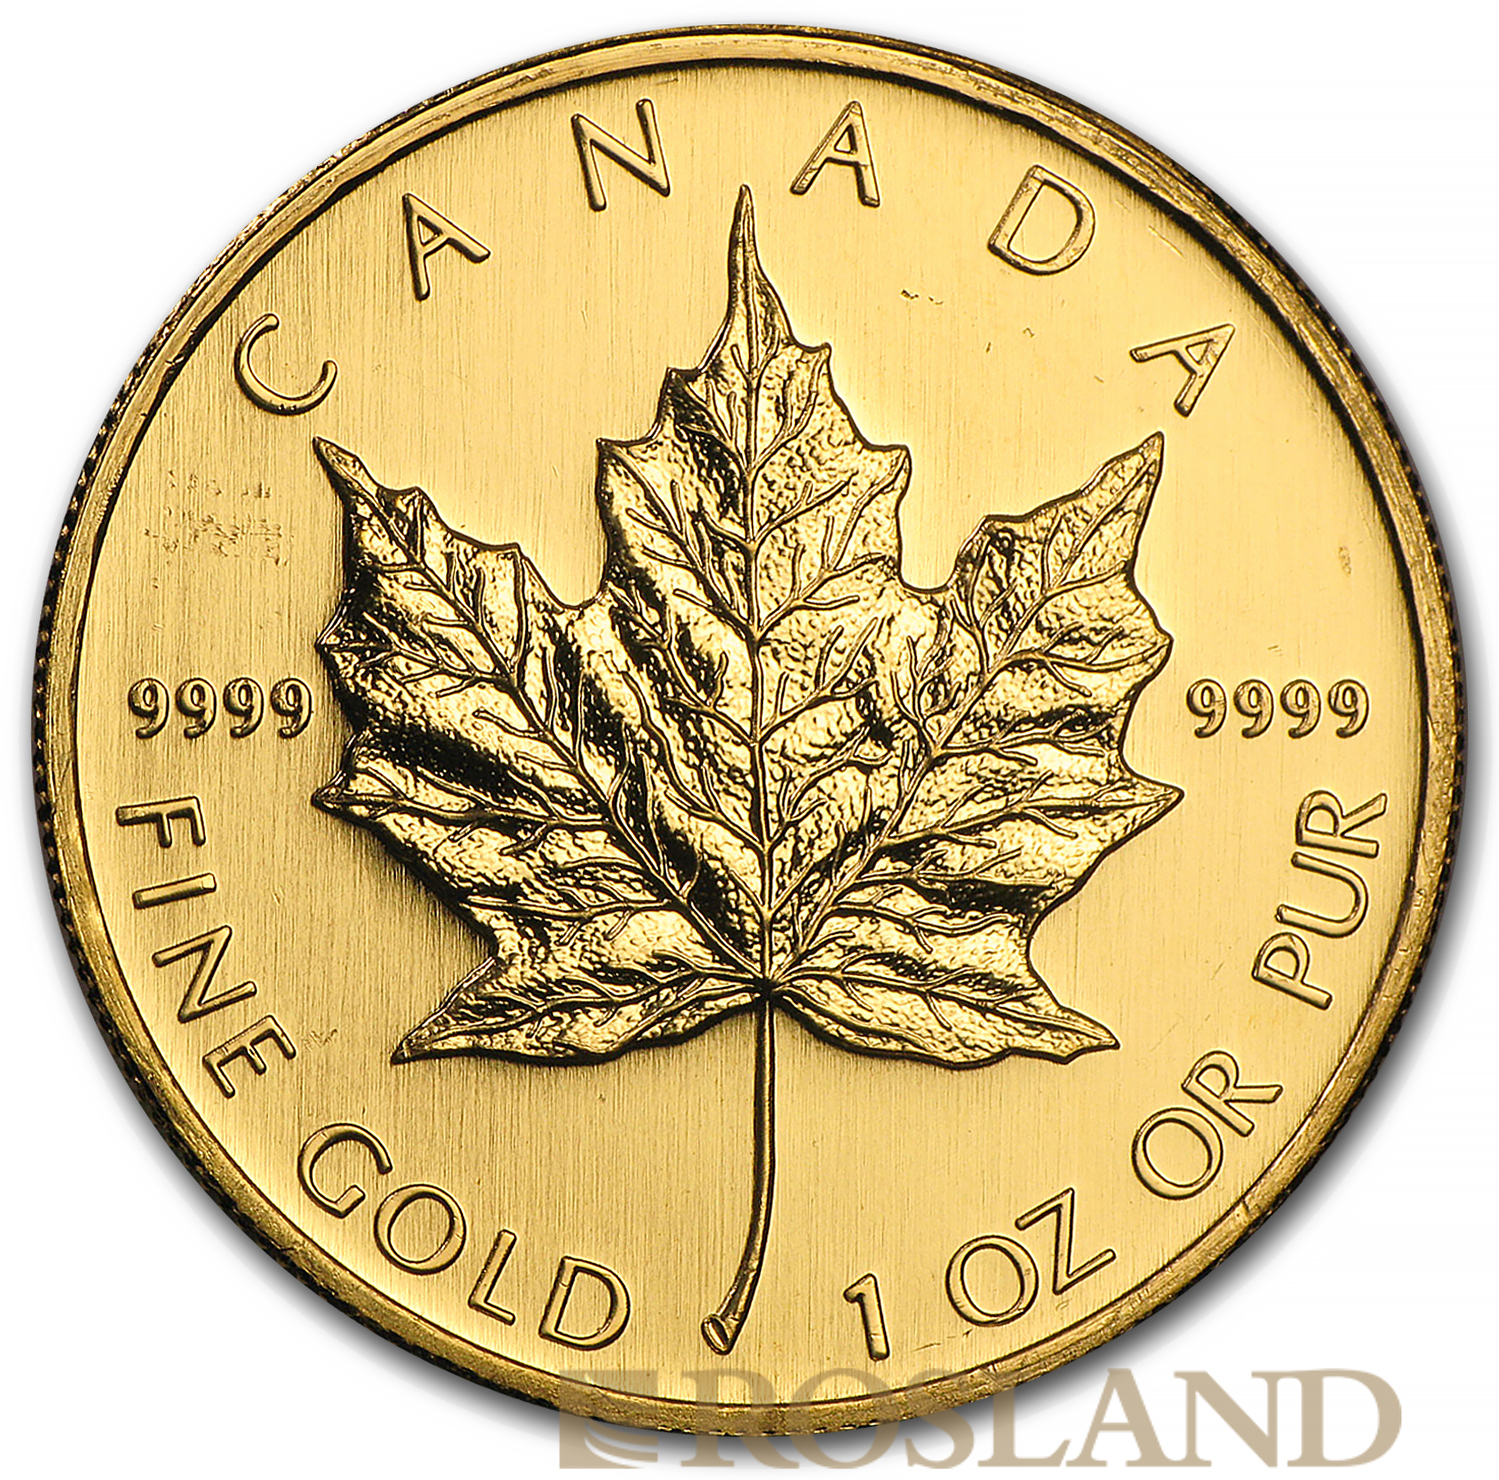 1 Unze Goldmünze Kanada Maple Leaf 2006